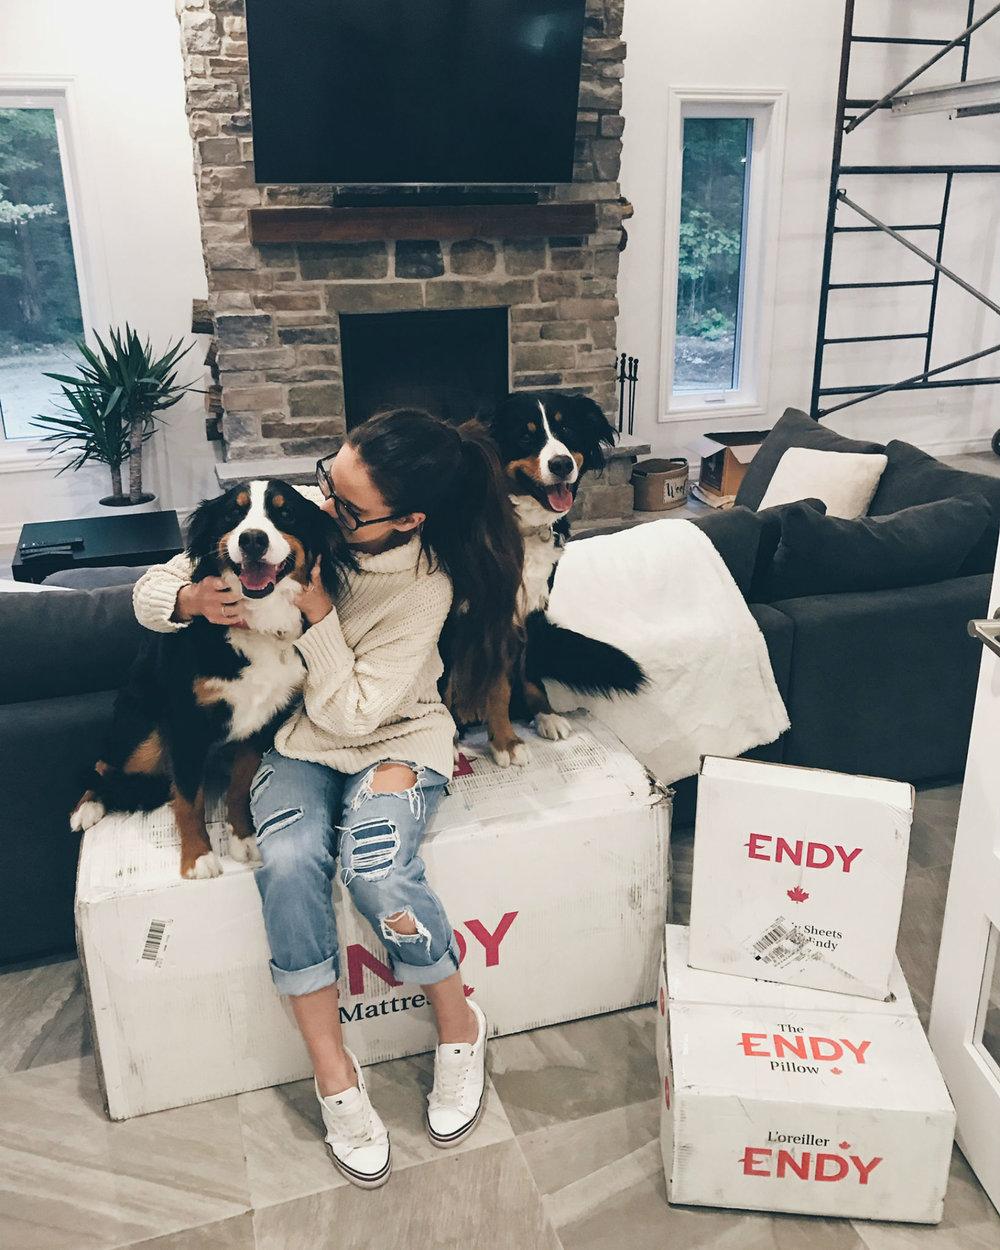 "Kim Demers (@kim_demers) - Demers is a vlogger on YouTube from Montreal. Along with her great content, her three dogs, Zara, Zoey and Zachary, are showstoppers.""Tellement heureuse d'avoir ENFIN reçu mon lit king @endy. Moi qui avait des problèmes de sommeil dernièrement, je vous confirme que je dort comme un bébé maintenant 👶🏻 #gifted #endypartner"""